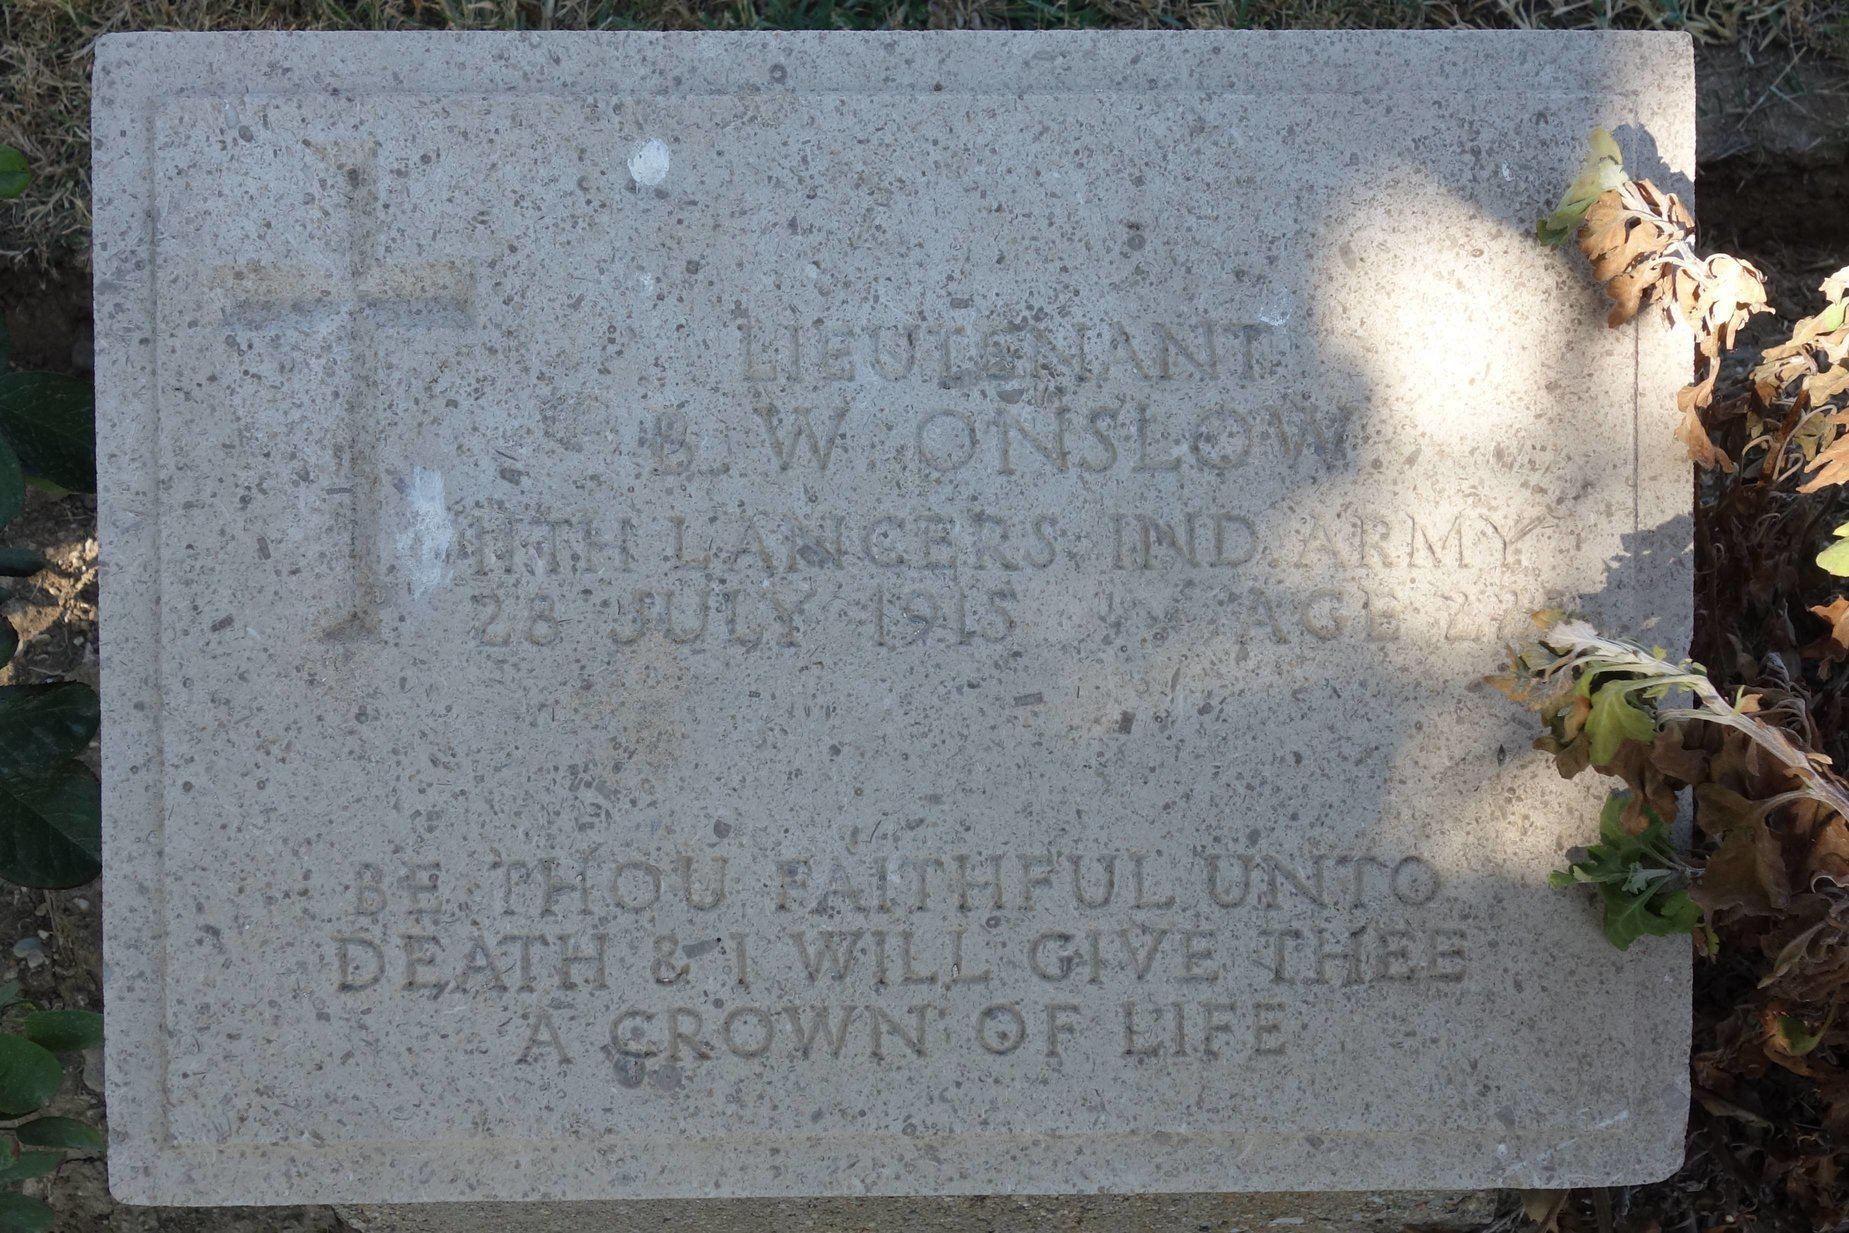 Onslow Beach Cemetery Gallipoli